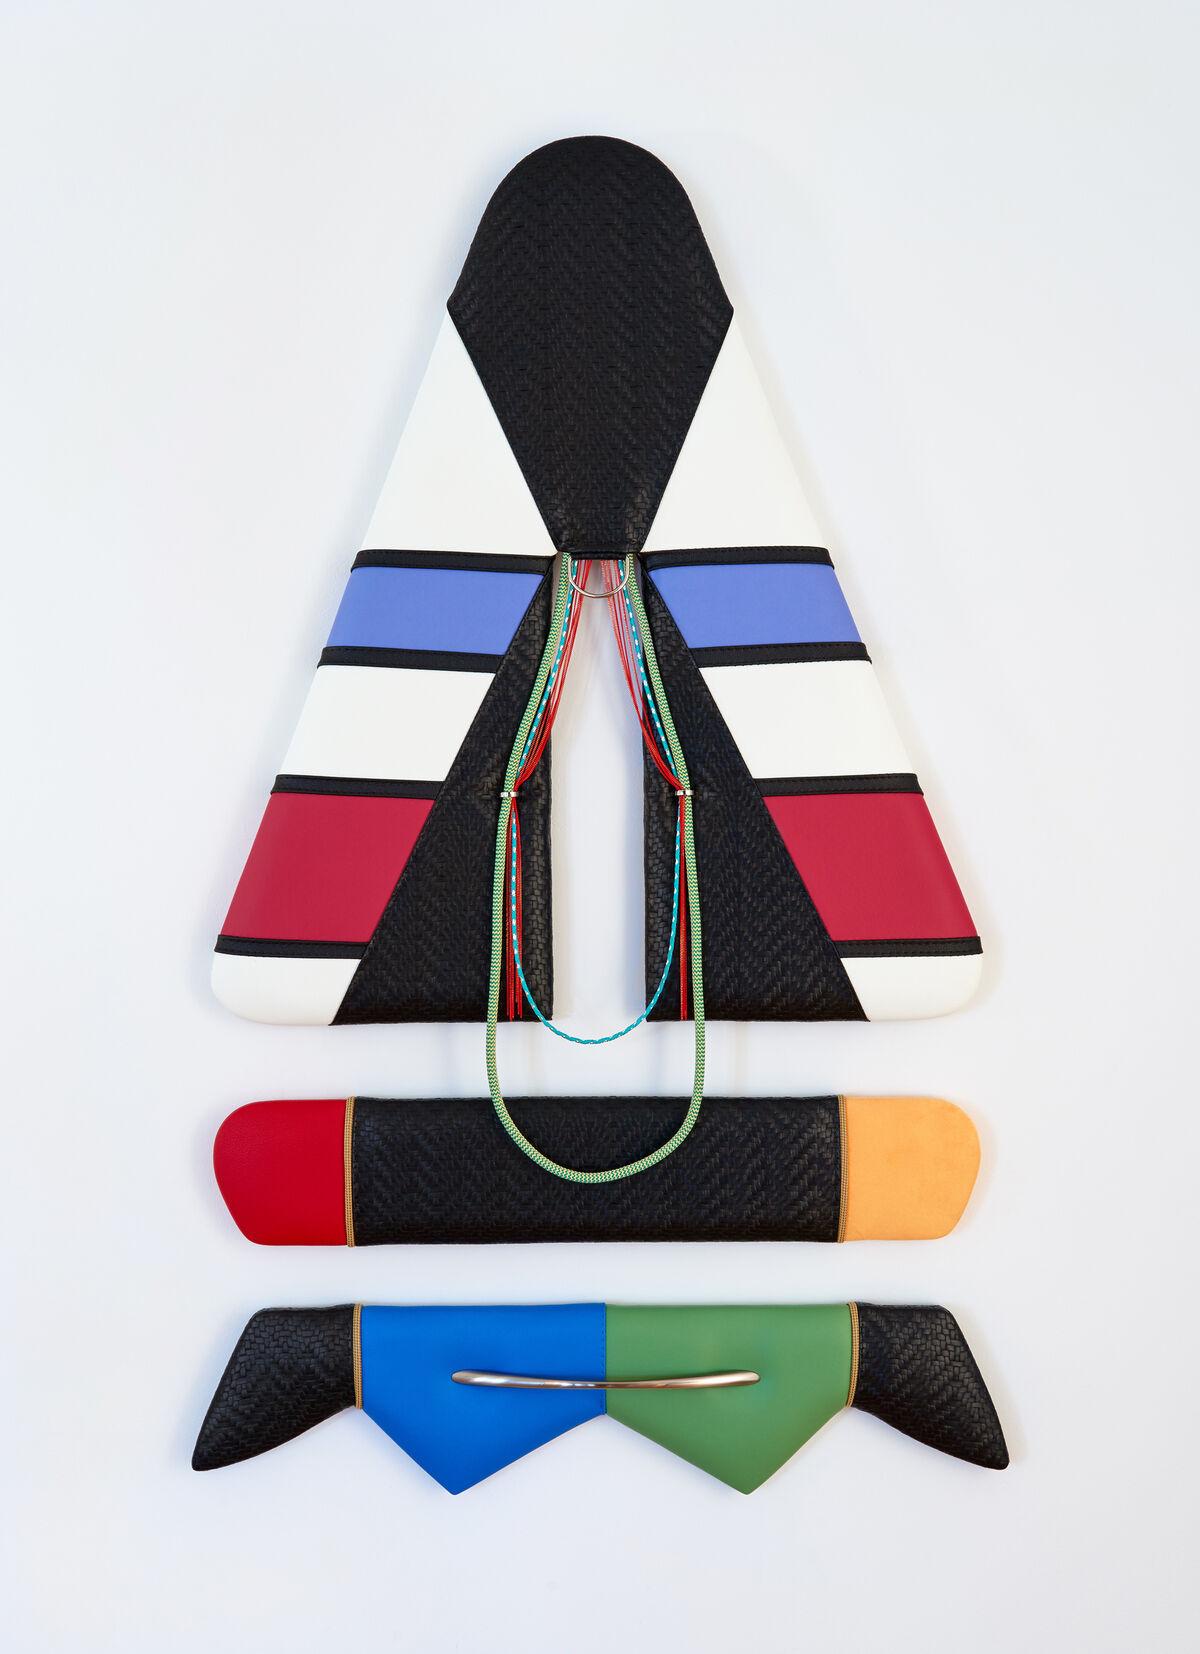 Trish Tillman, Scintillator, 2017. Courtesy of Asya Geisberg Gallery.